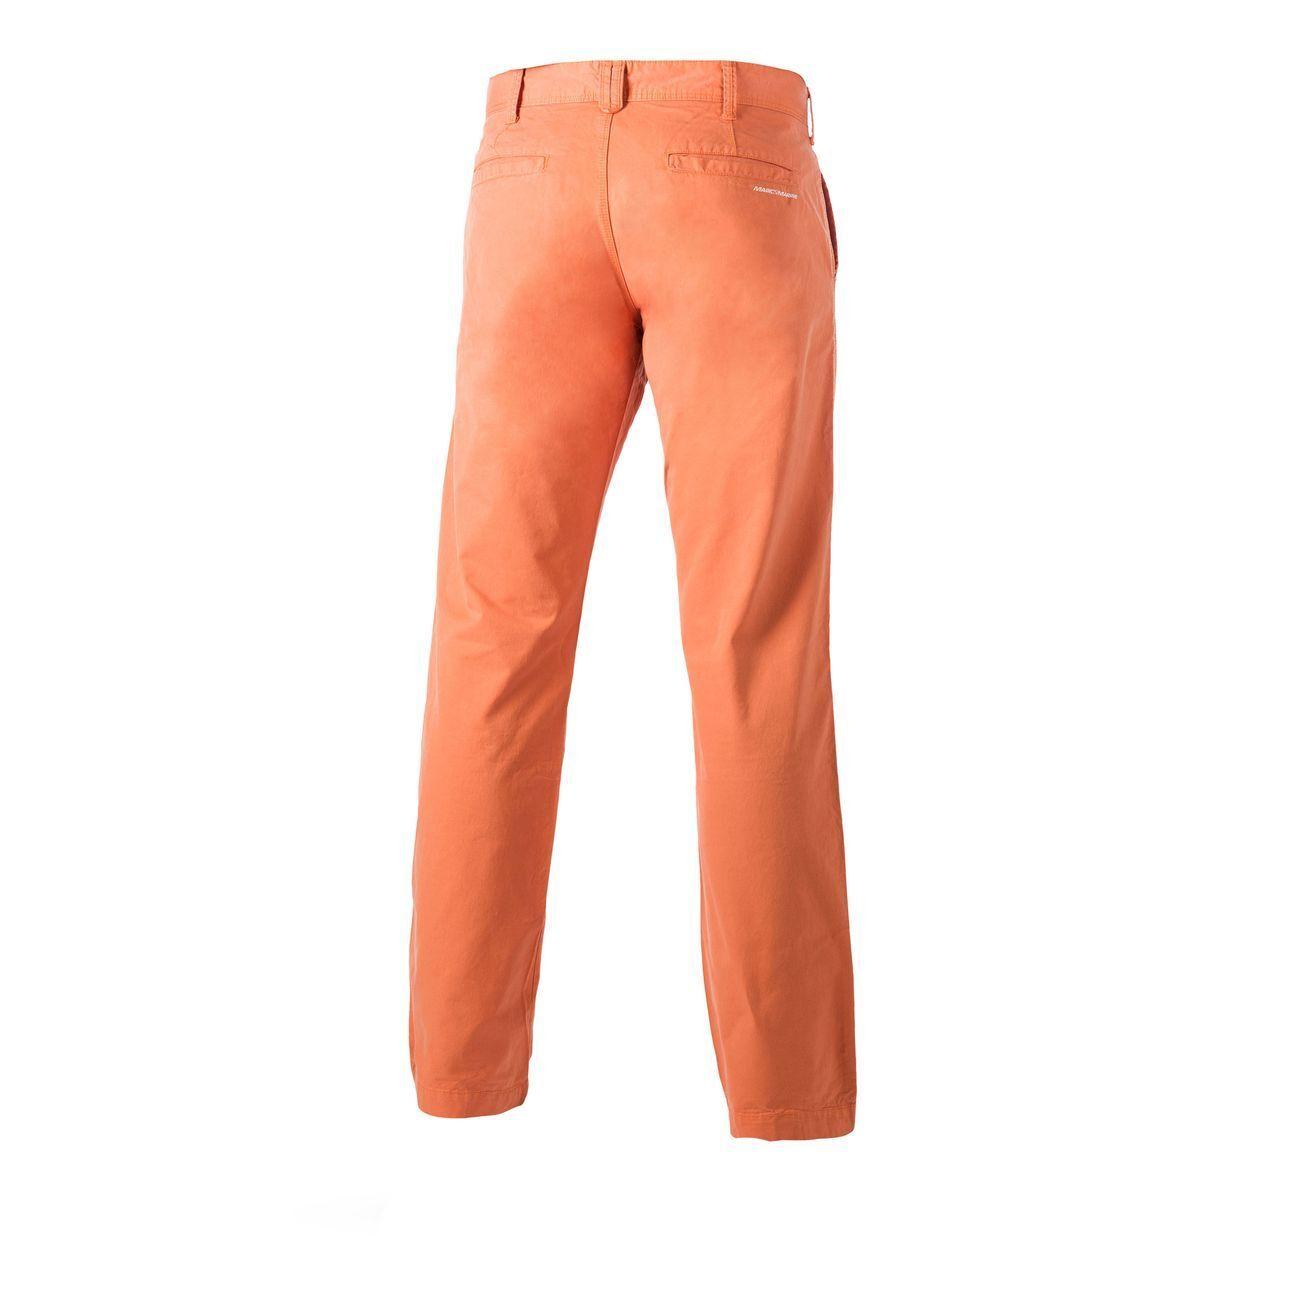 Magic Marine Herren Chino Hose Hose Hose Freizeithose Sommerhose Stoffhose Trousers df9036